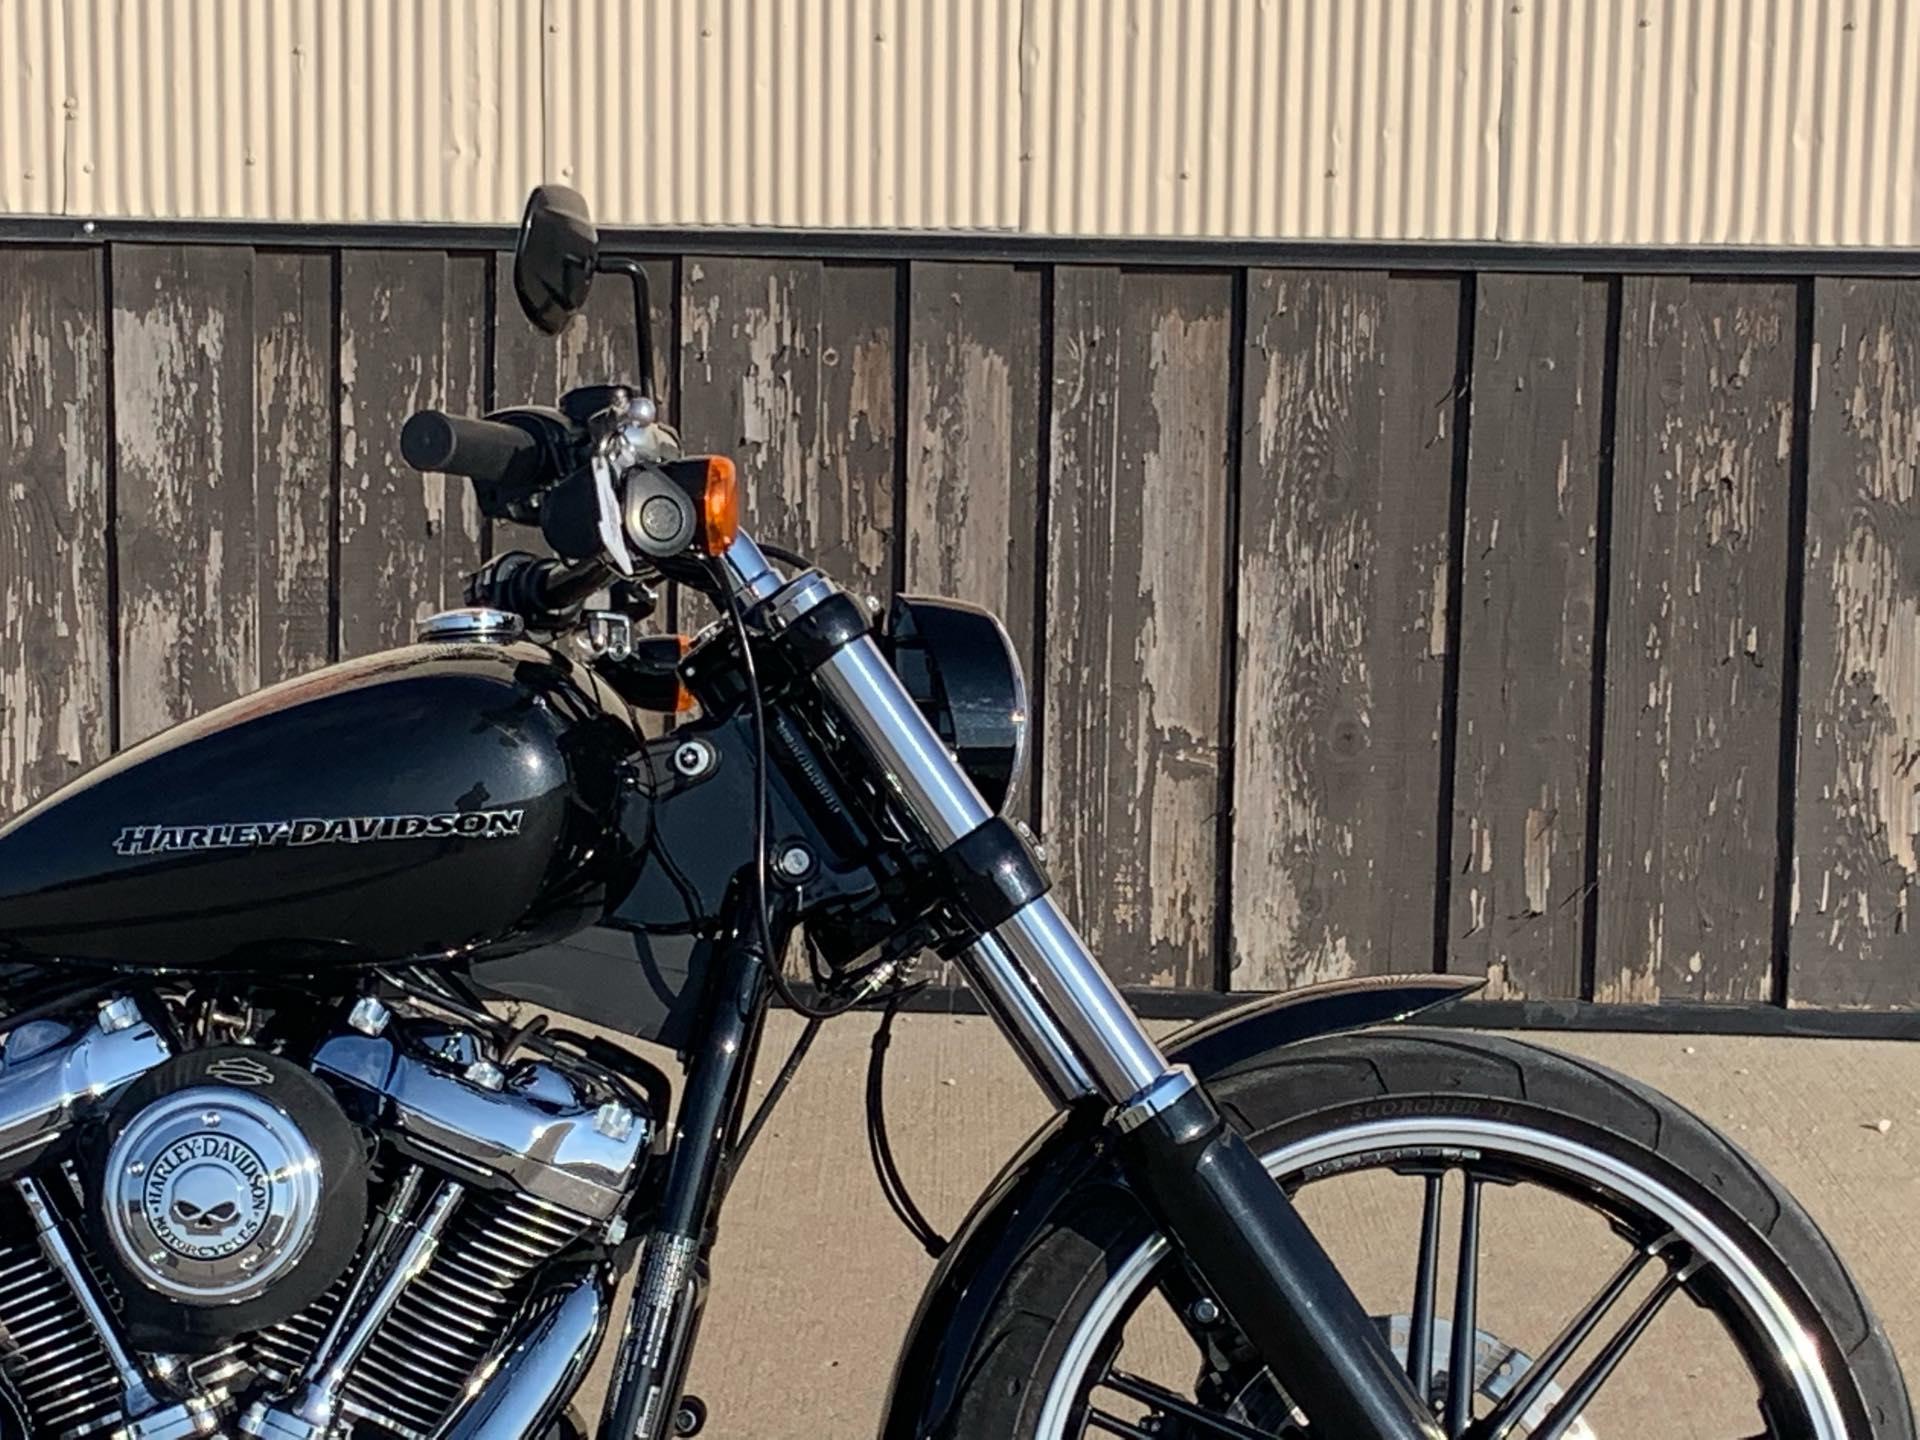 2018 Harley-Davidson Softail Breakout at Loess Hills Harley-Davidson